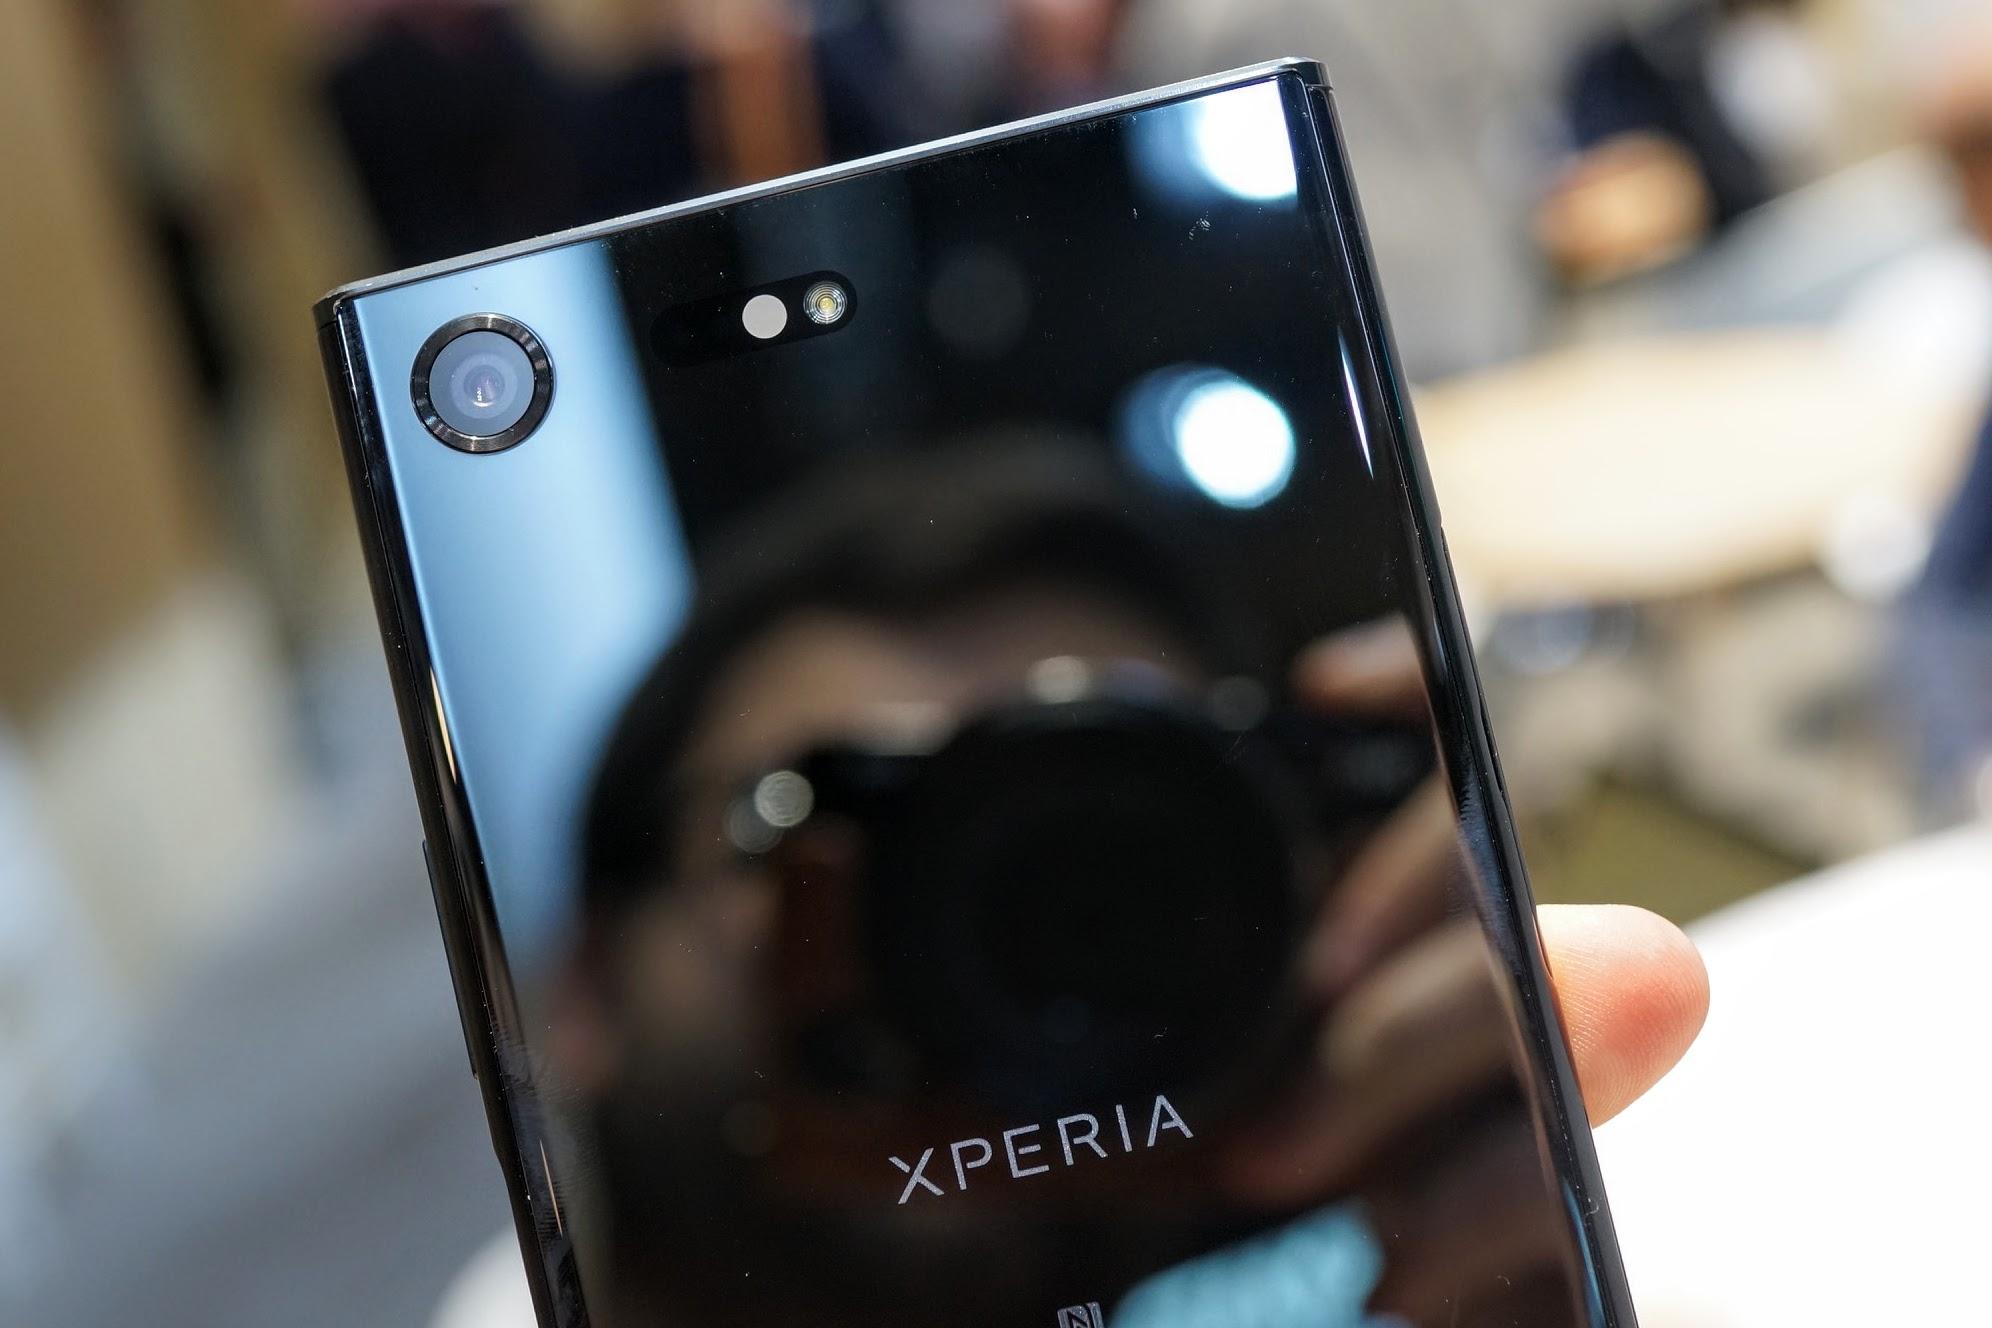 Le Sony Xperia XZ Premium arrive en juin